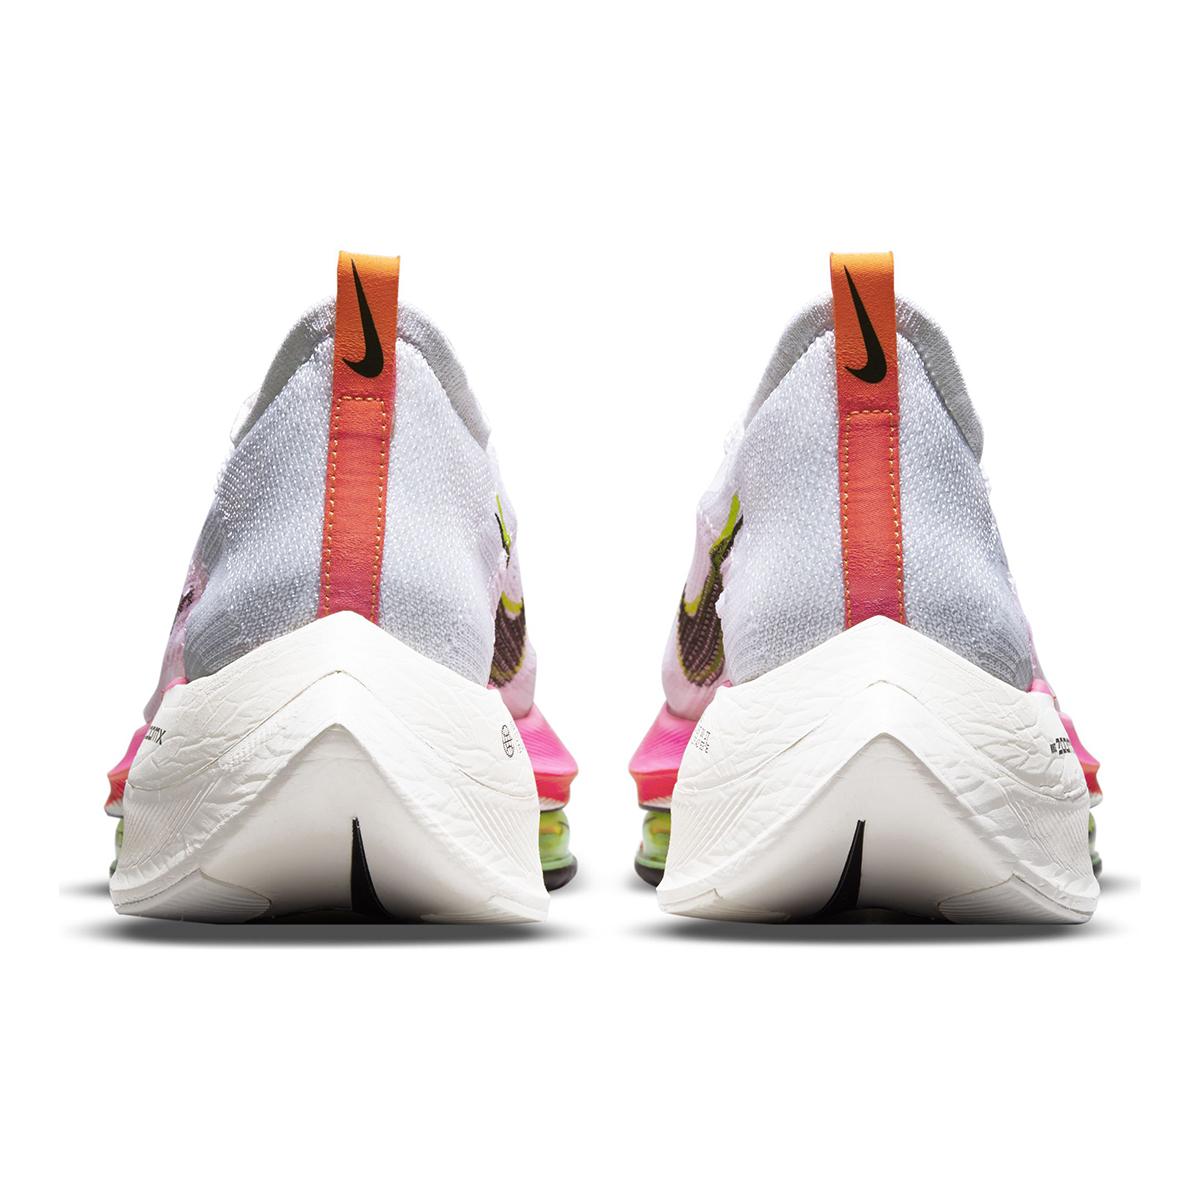 Men's Nike Air Zoom Alphafly Next% Flyknit Running Shoe - Color: Rawdacious - Size: 6 - Width: Regular, Rawdacious, large, image 6